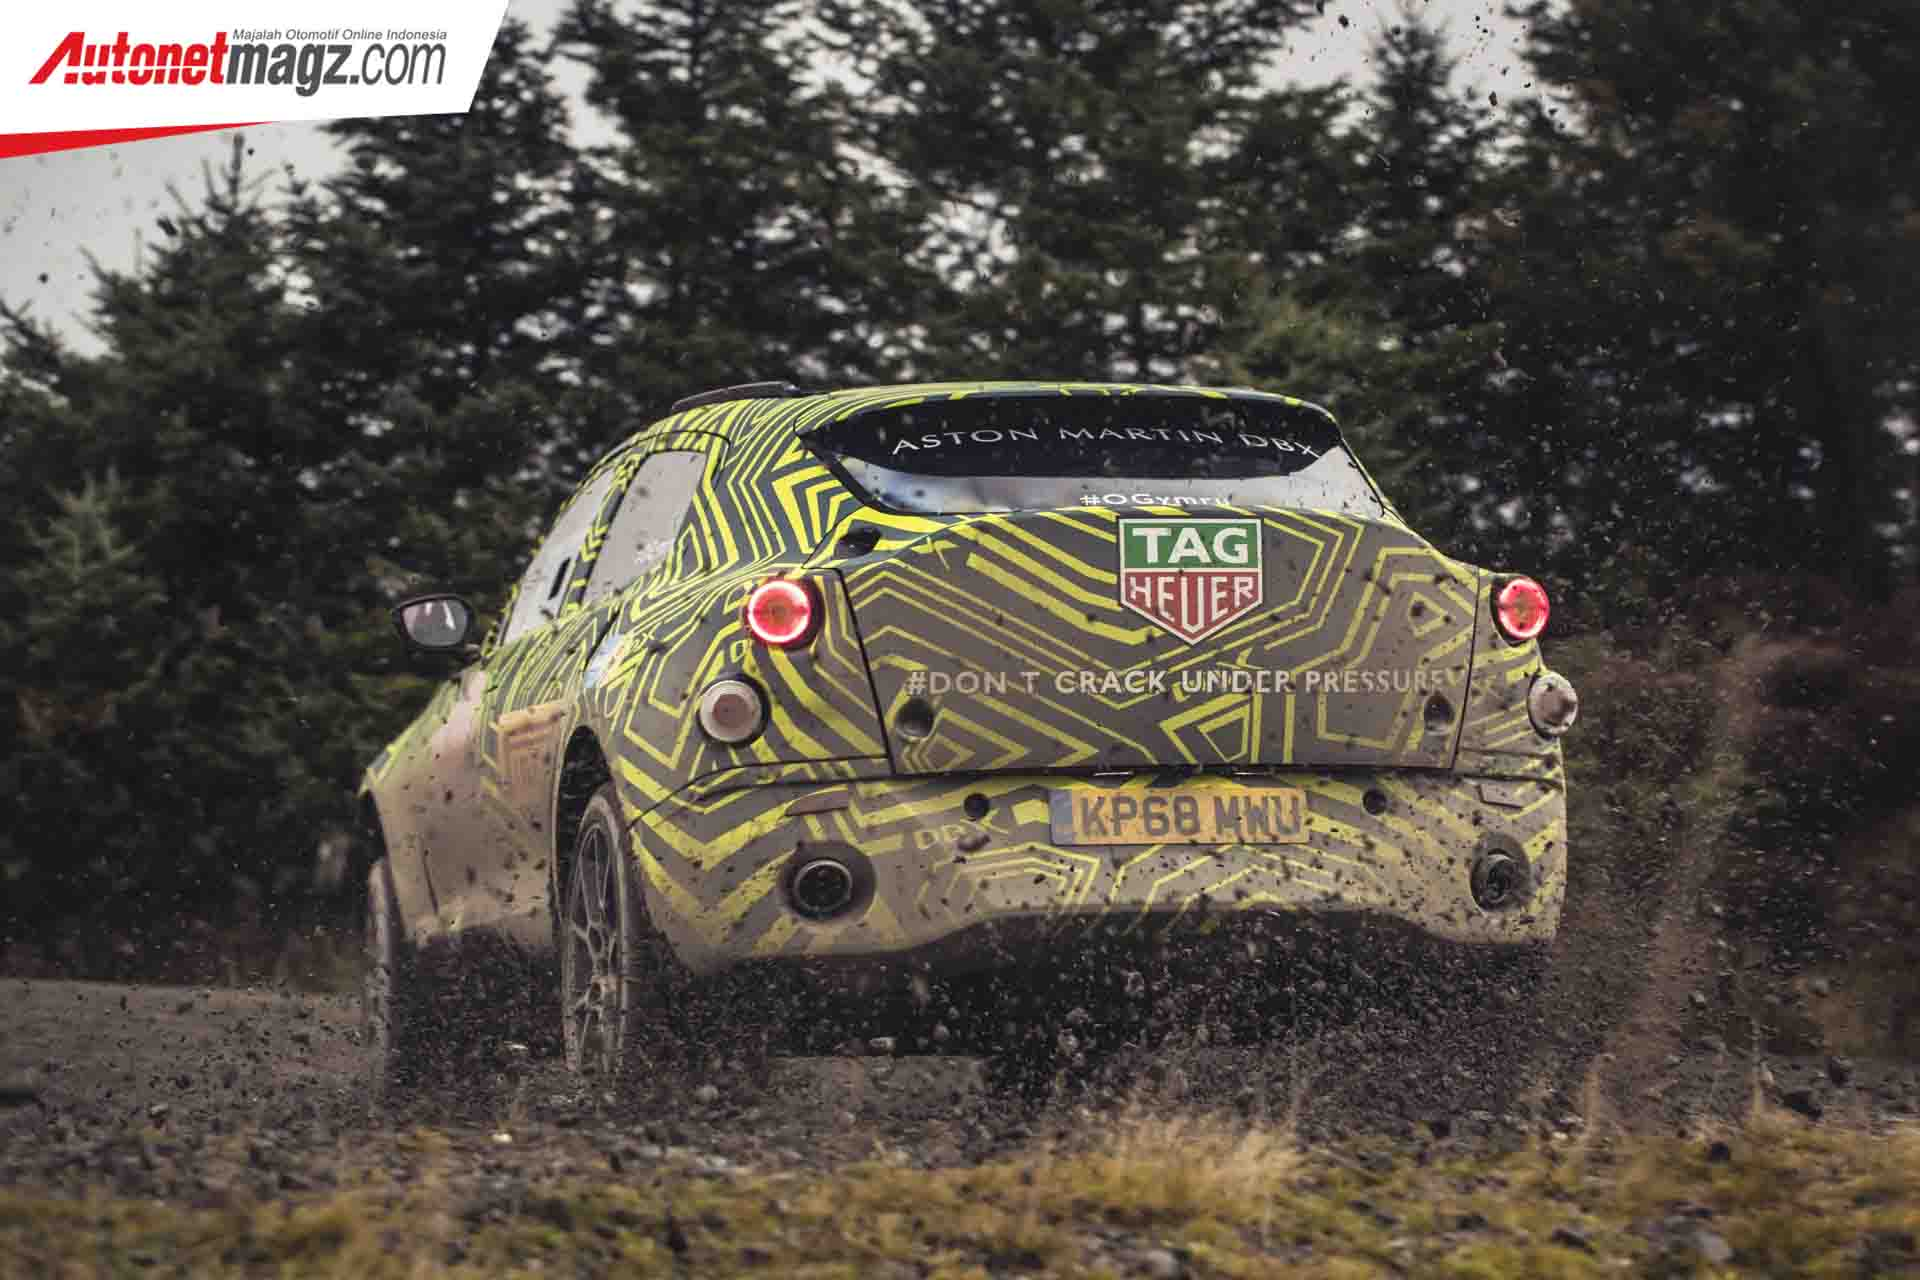 harga aston martin dbx – autonetmagz :: review mobil dan motor baru